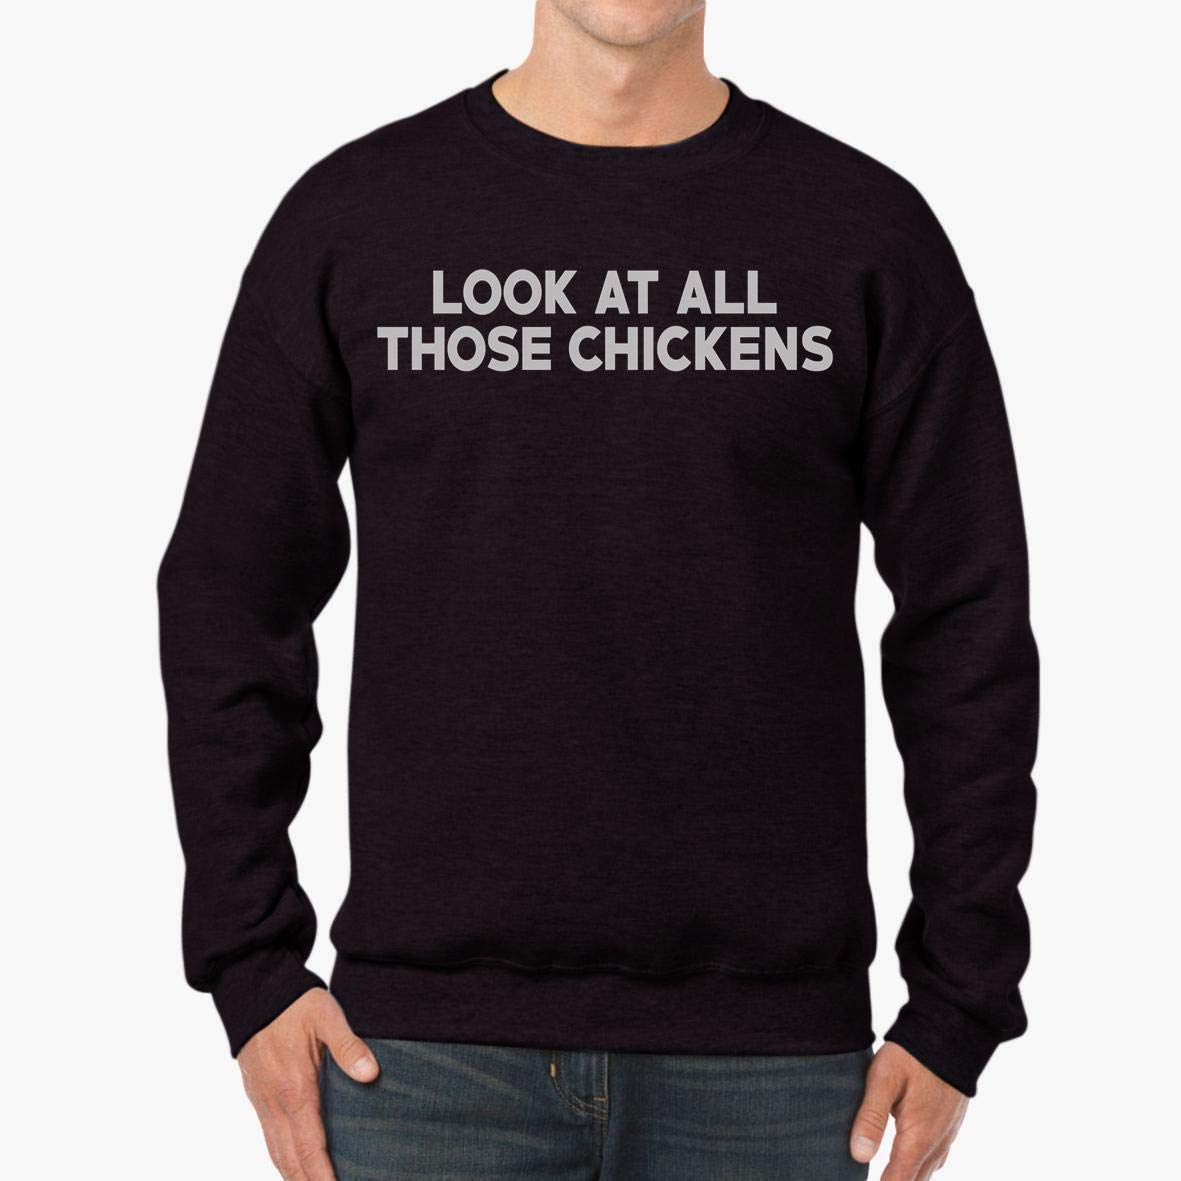 tee Doryti Look at All Those Chickens Funny Meme Unisex Sweatshirt